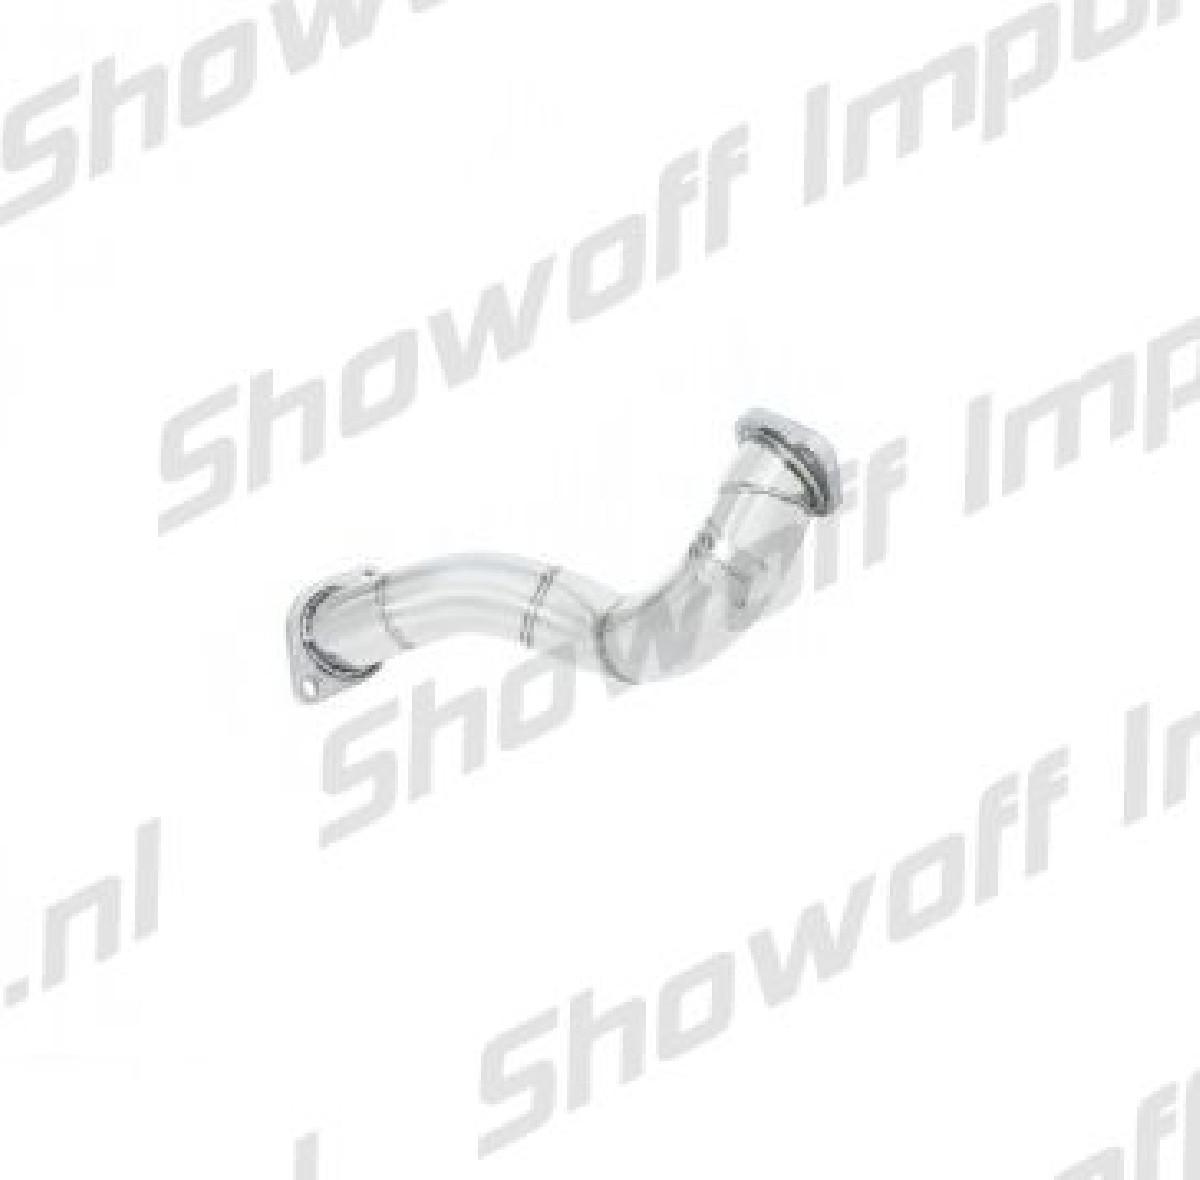 Subaru BRZ Stainless Steel Uppipe [SIX]